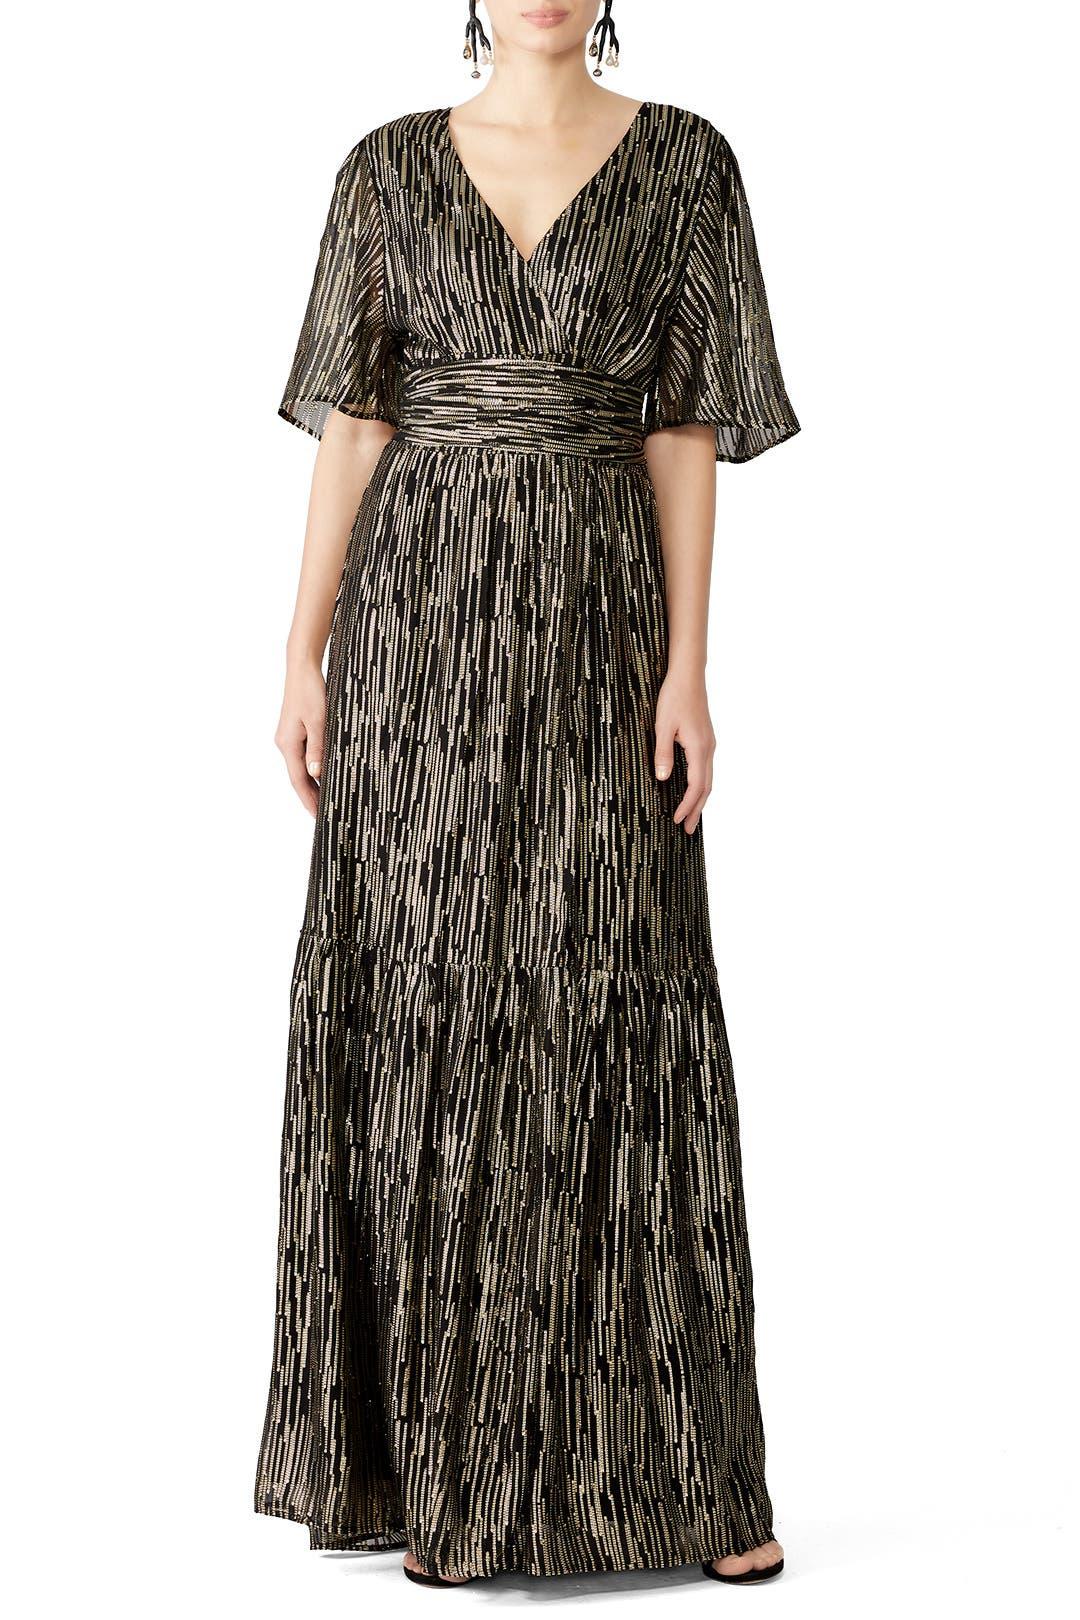 Gown Runway By Nixon The Ba Metallic amp;sh For95110Rent PNwkXZ8n0O